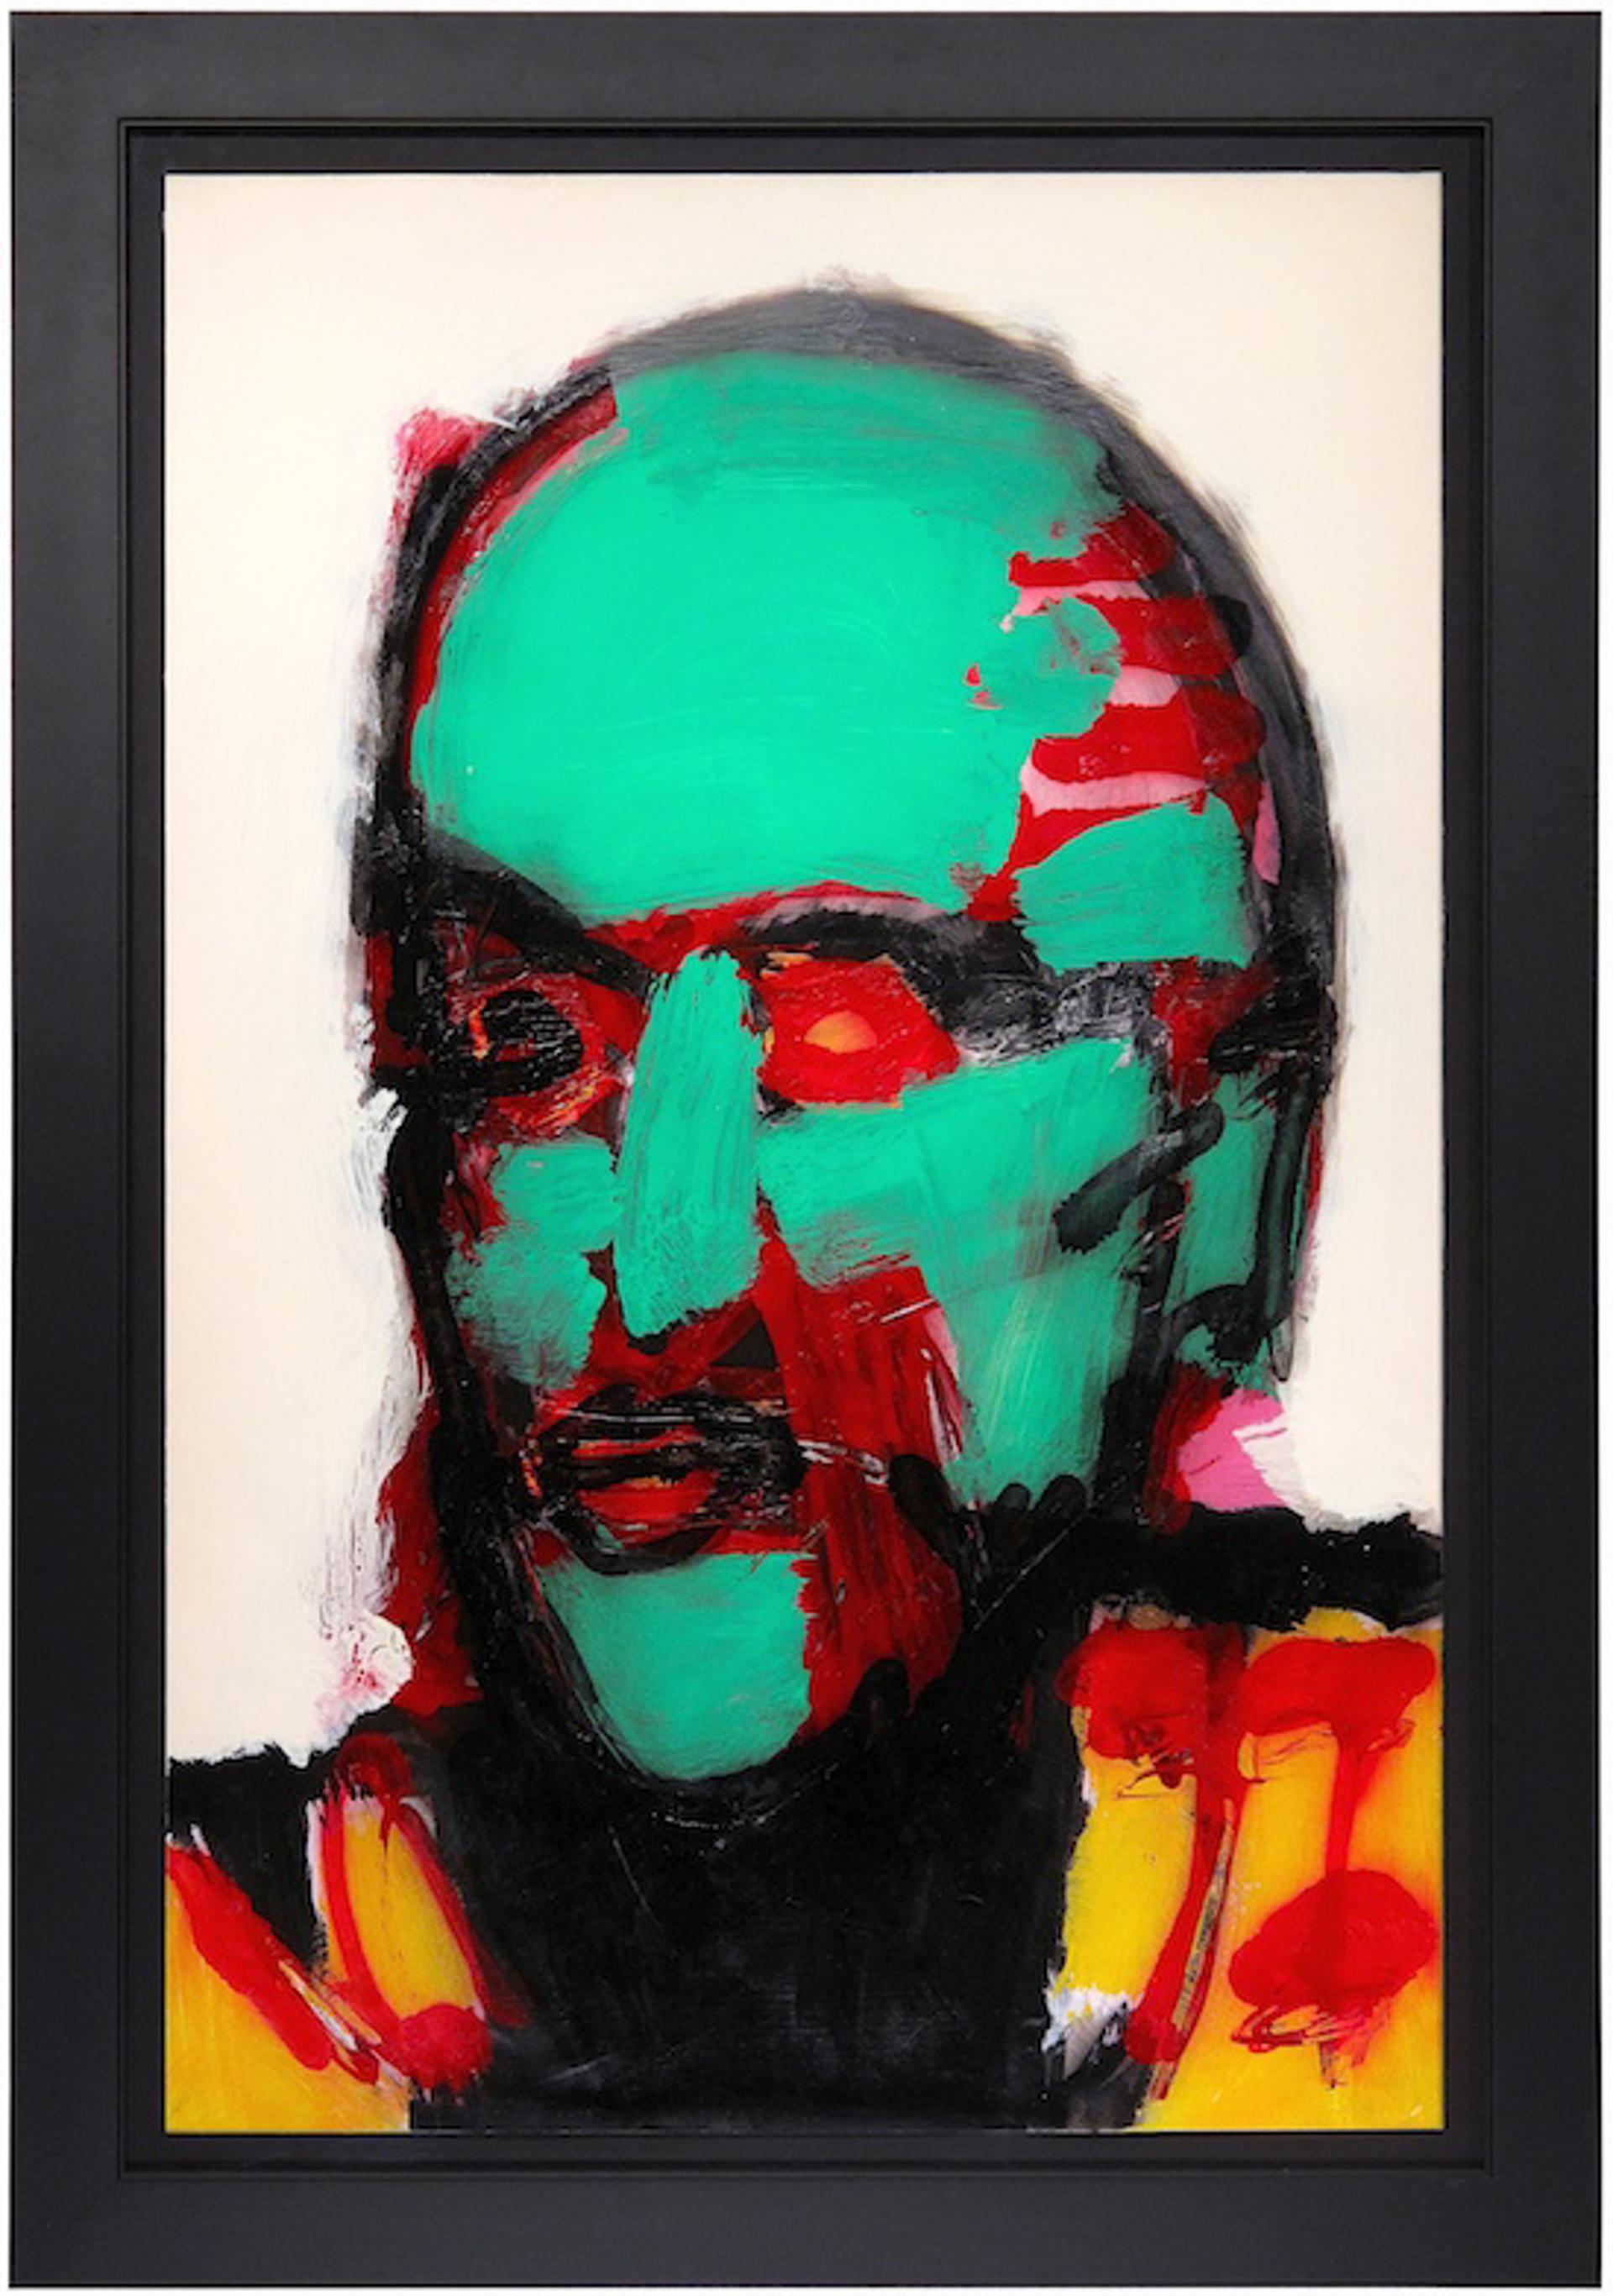 Green Head, Red Eyes by Nick Vukmanovich